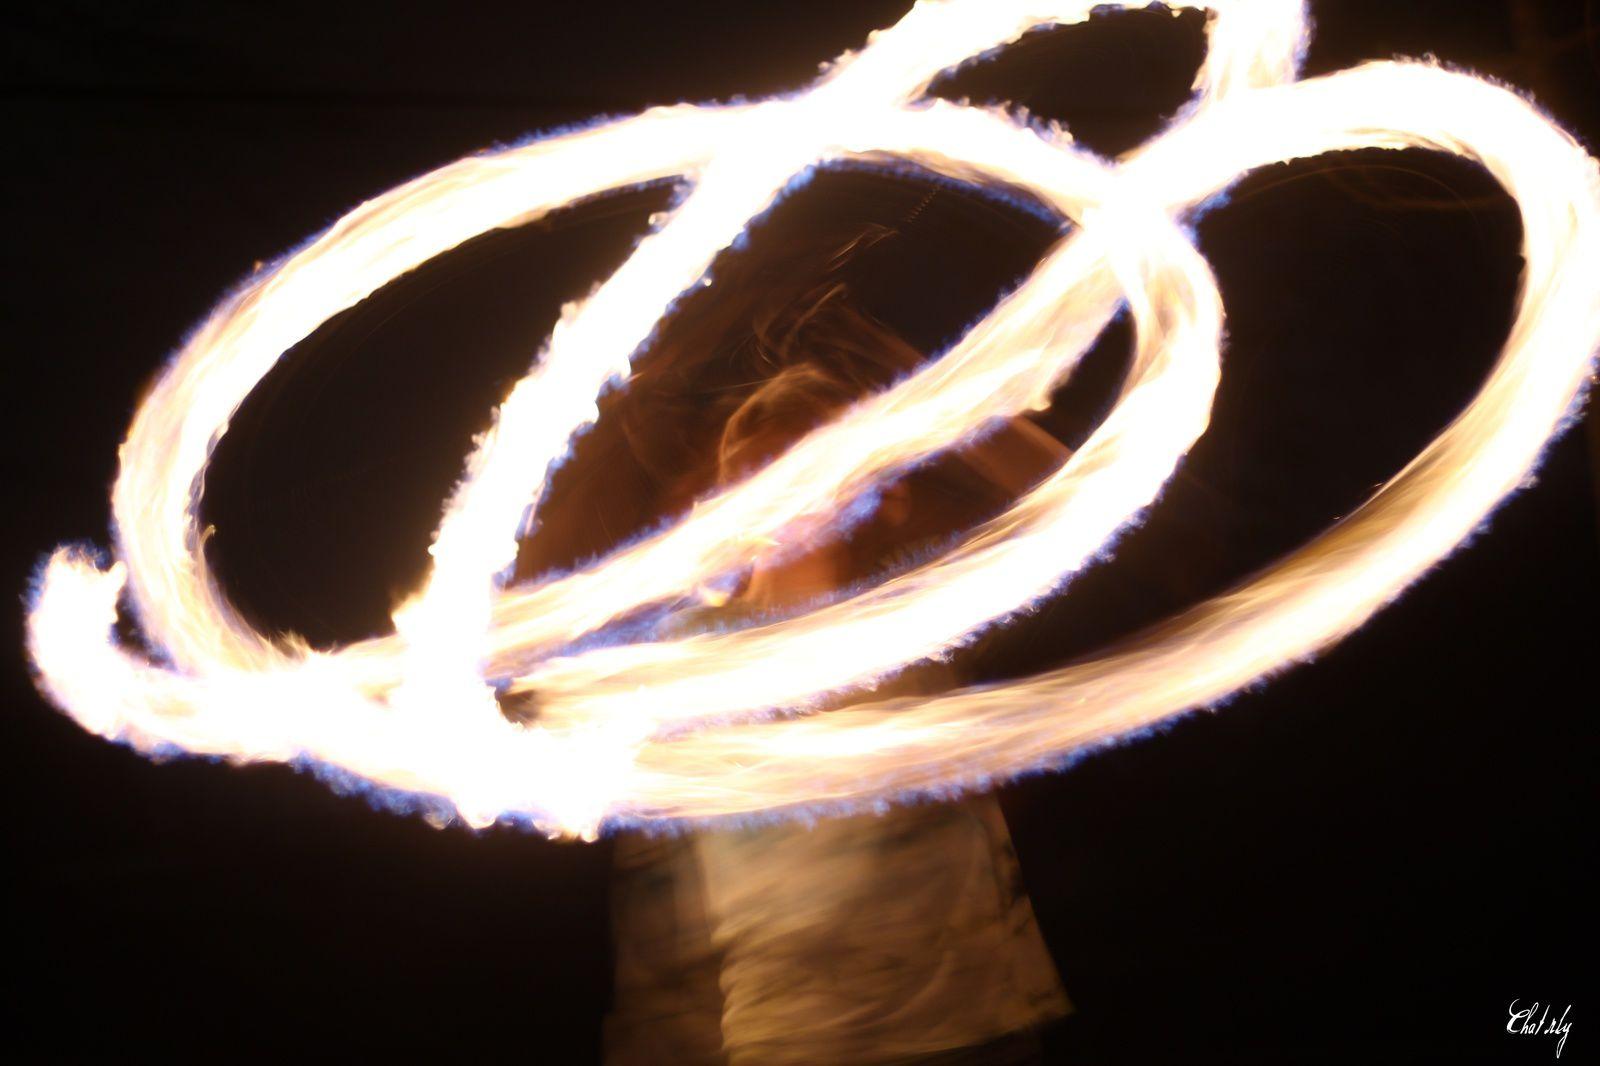 The Fire dance (Austin, TEXAS)